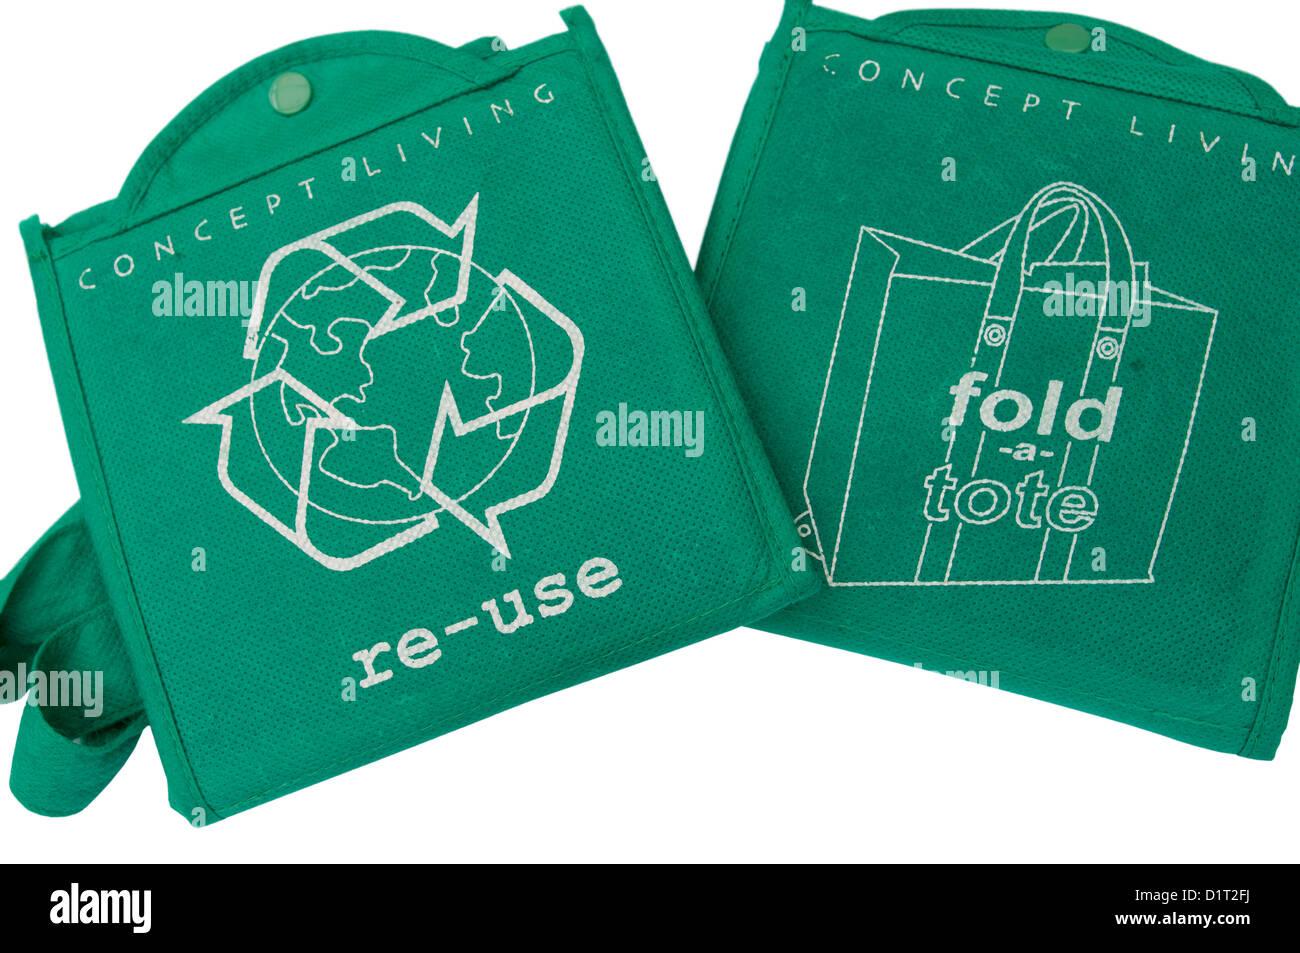 Reusable Shopping Bags - Stock Image